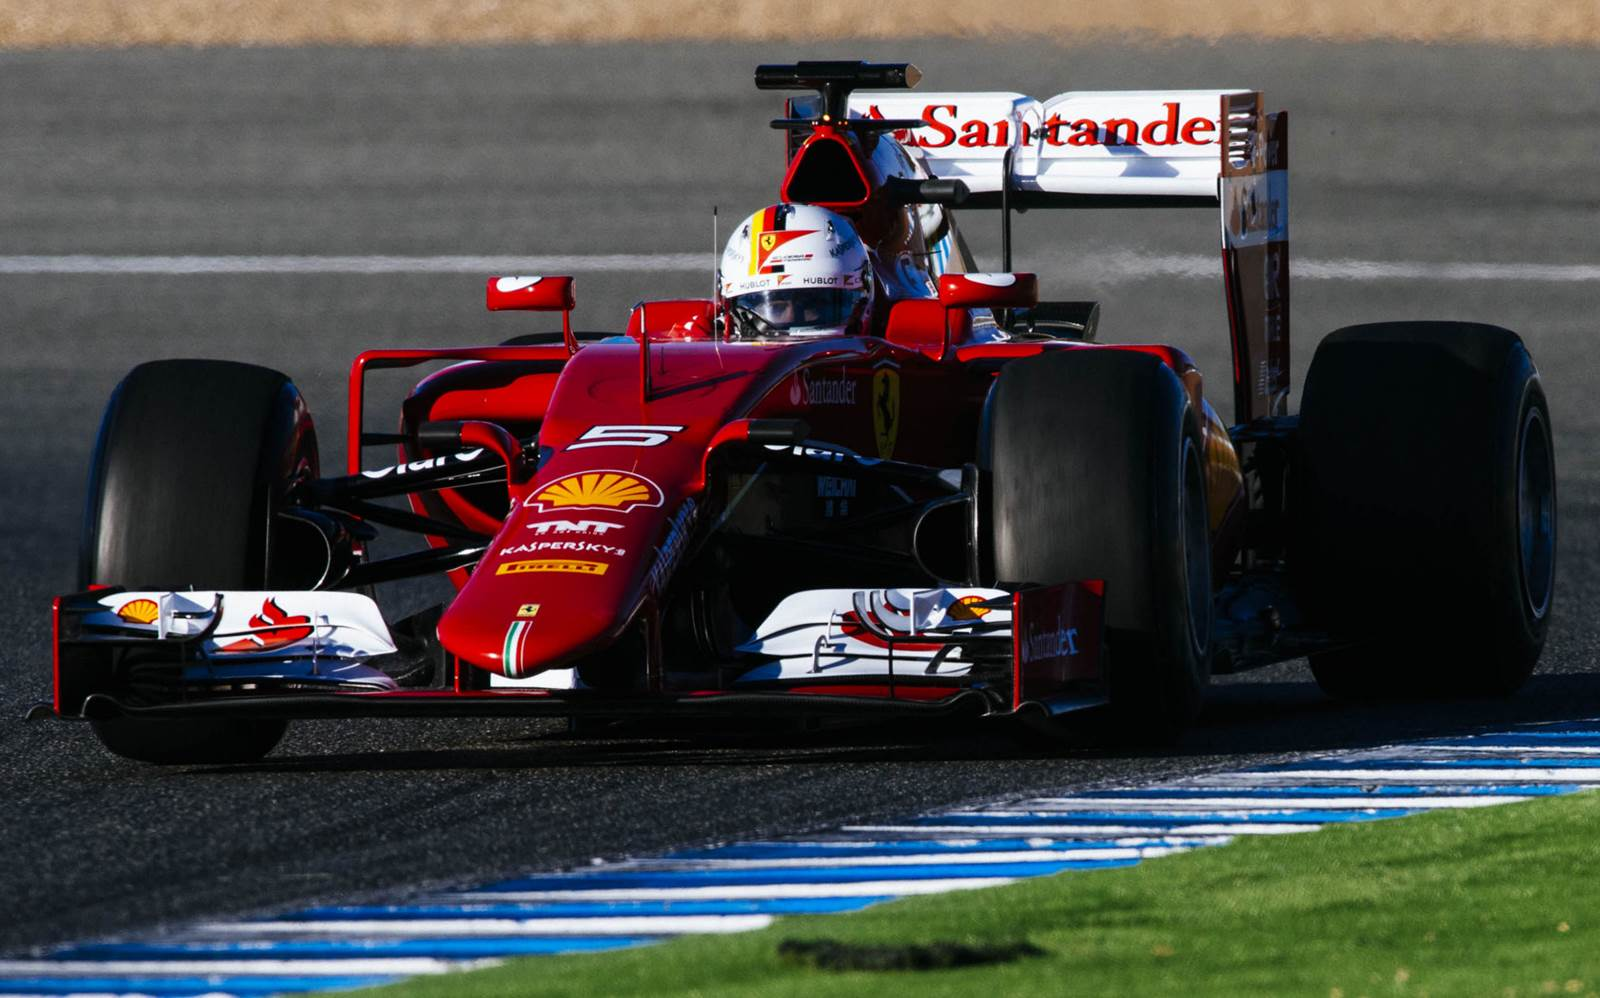 Ferrrari F-1 2015 - Sebastian Vettel